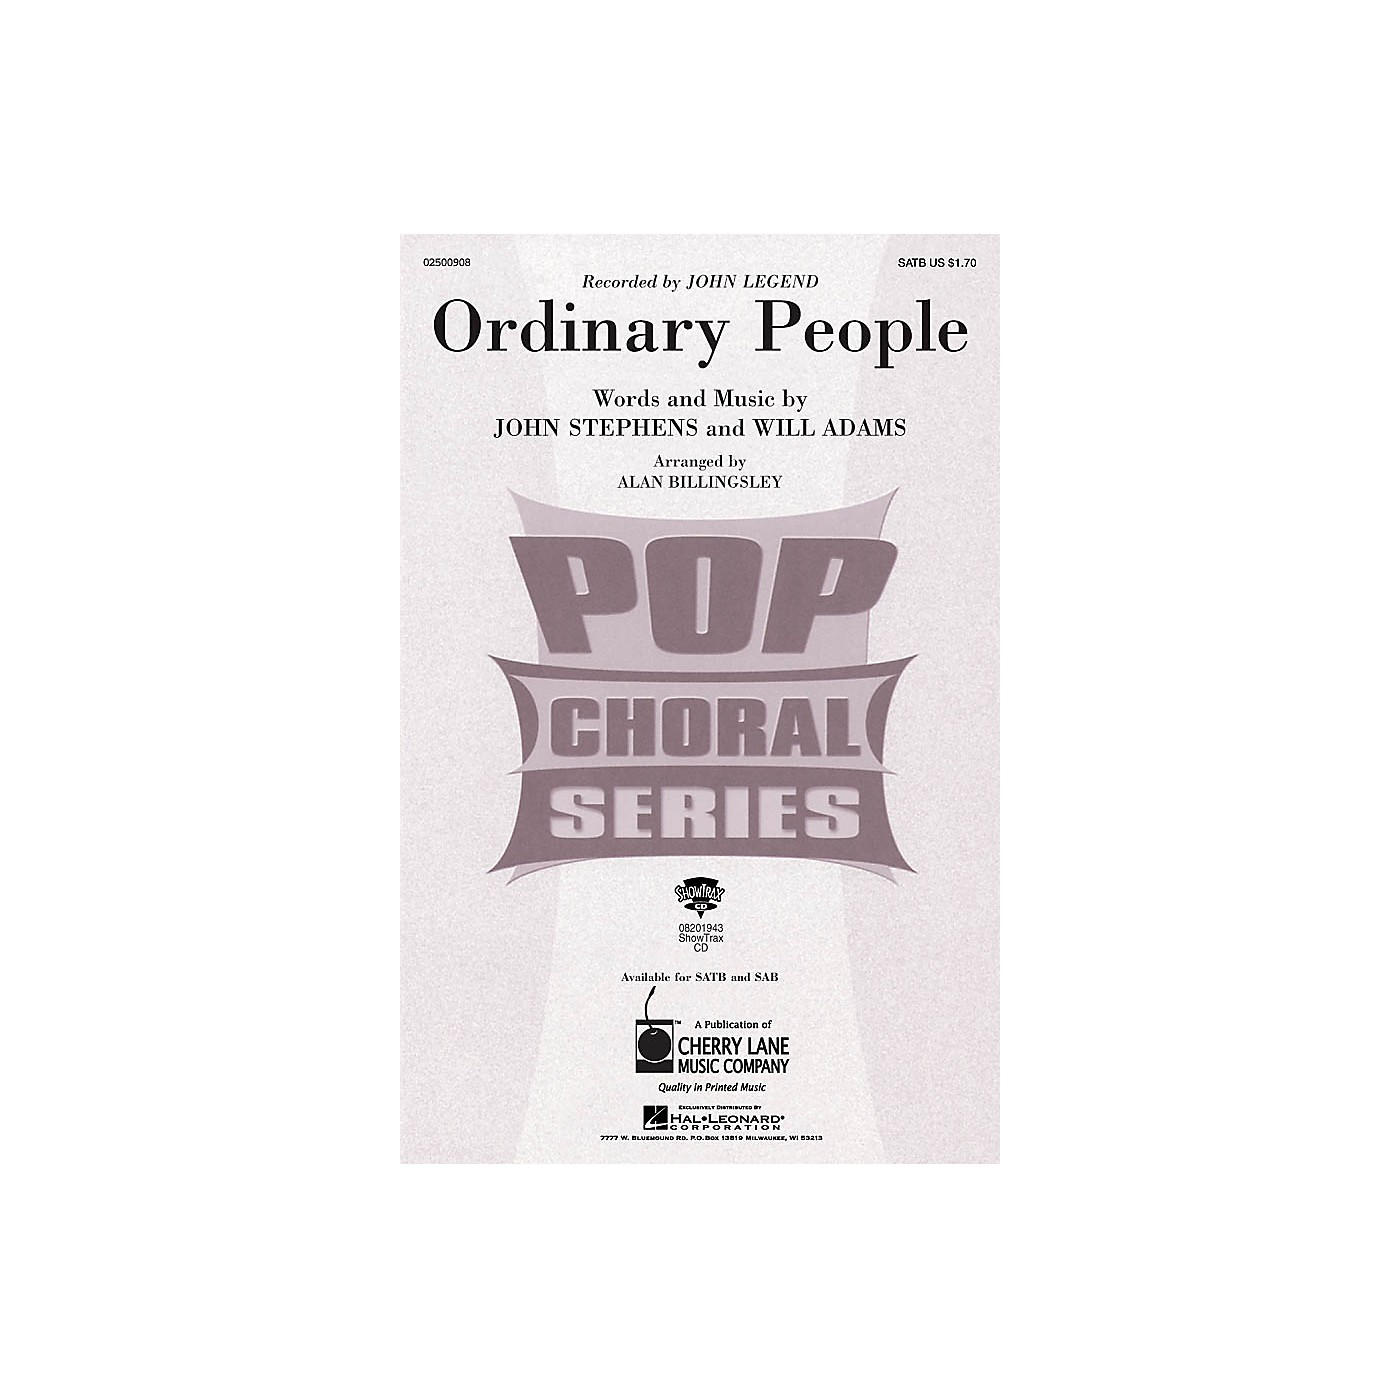 Hal Leonard Ordinary People ShowTrax CD by John Legend Arranged by Alan Billingsley thumbnail